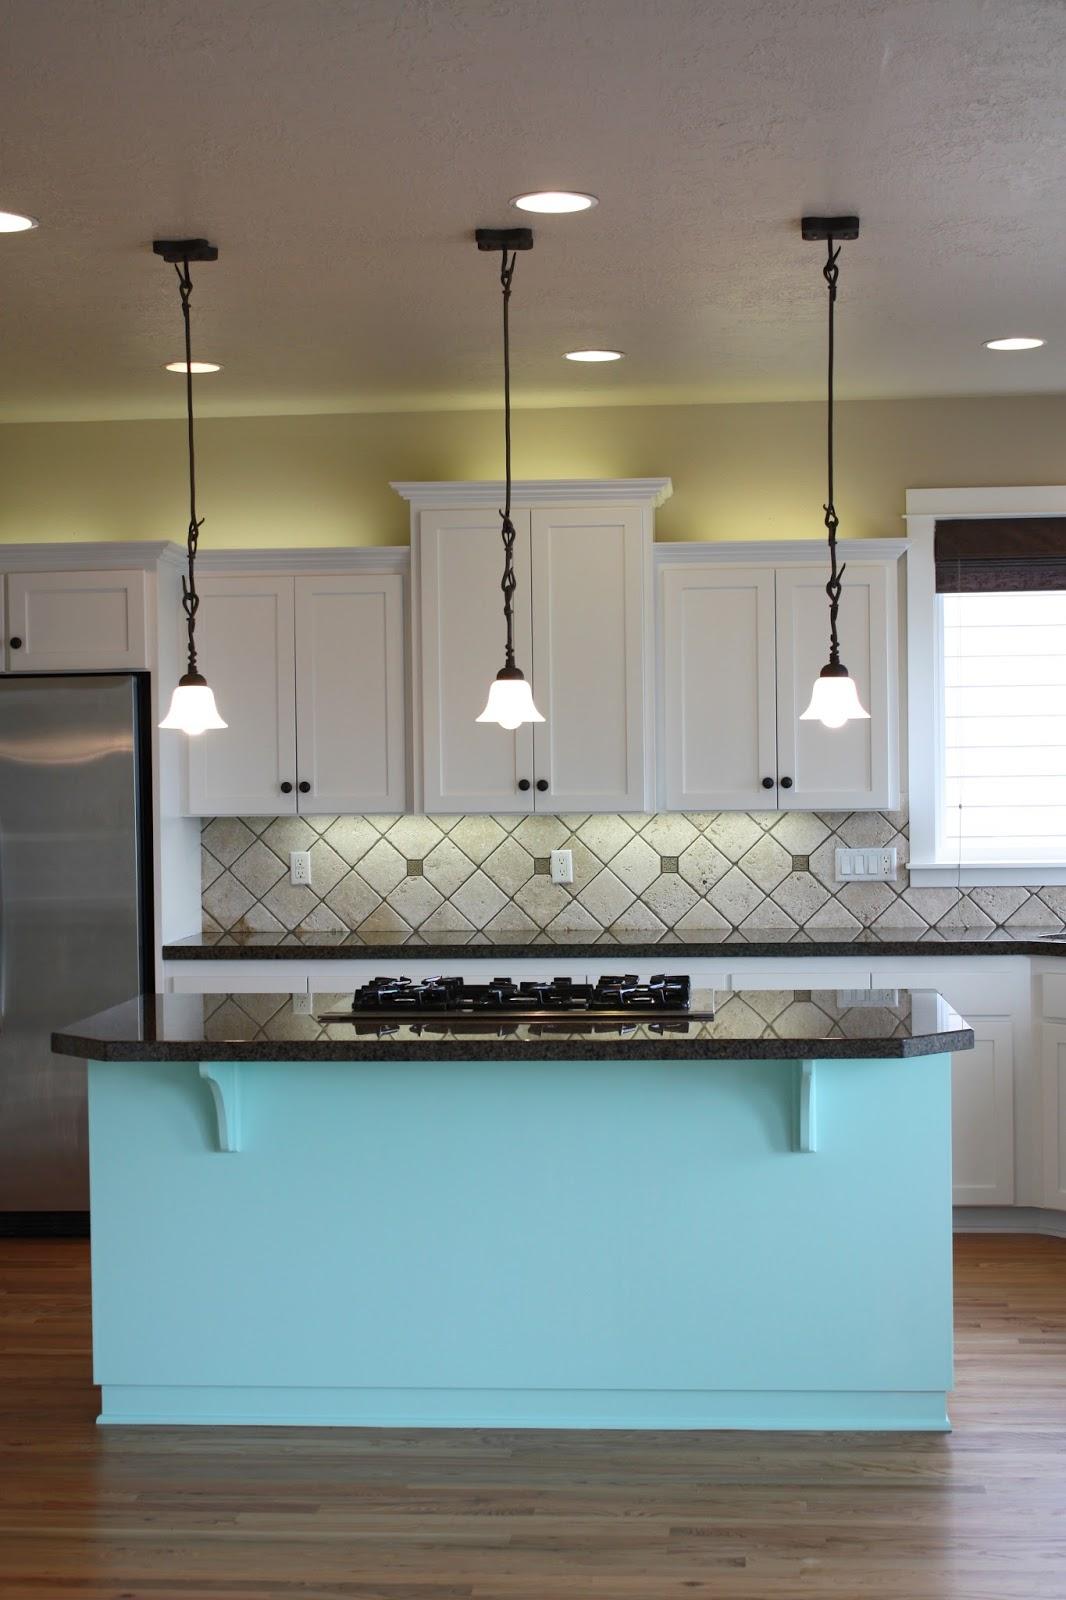 Great Scotts: My new kitchen.